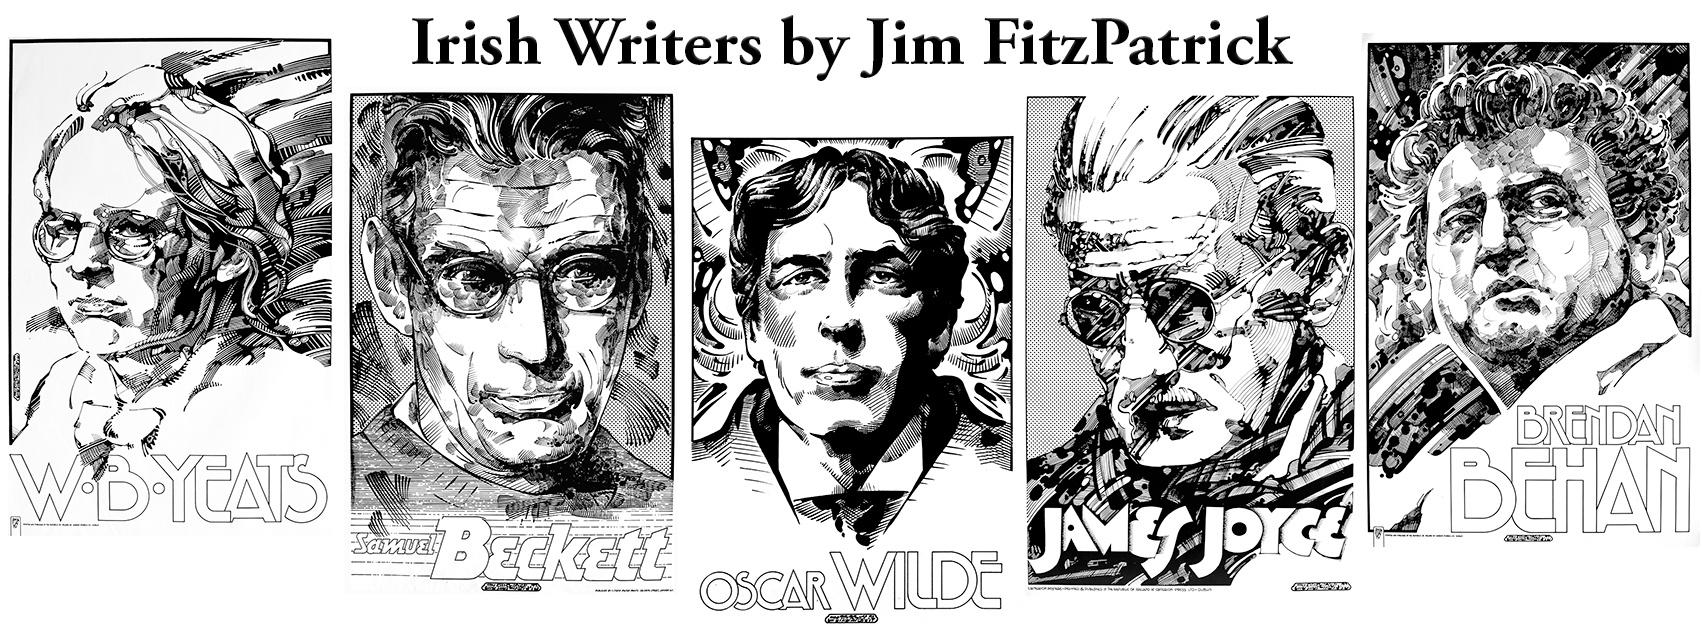 Irish writers byJF